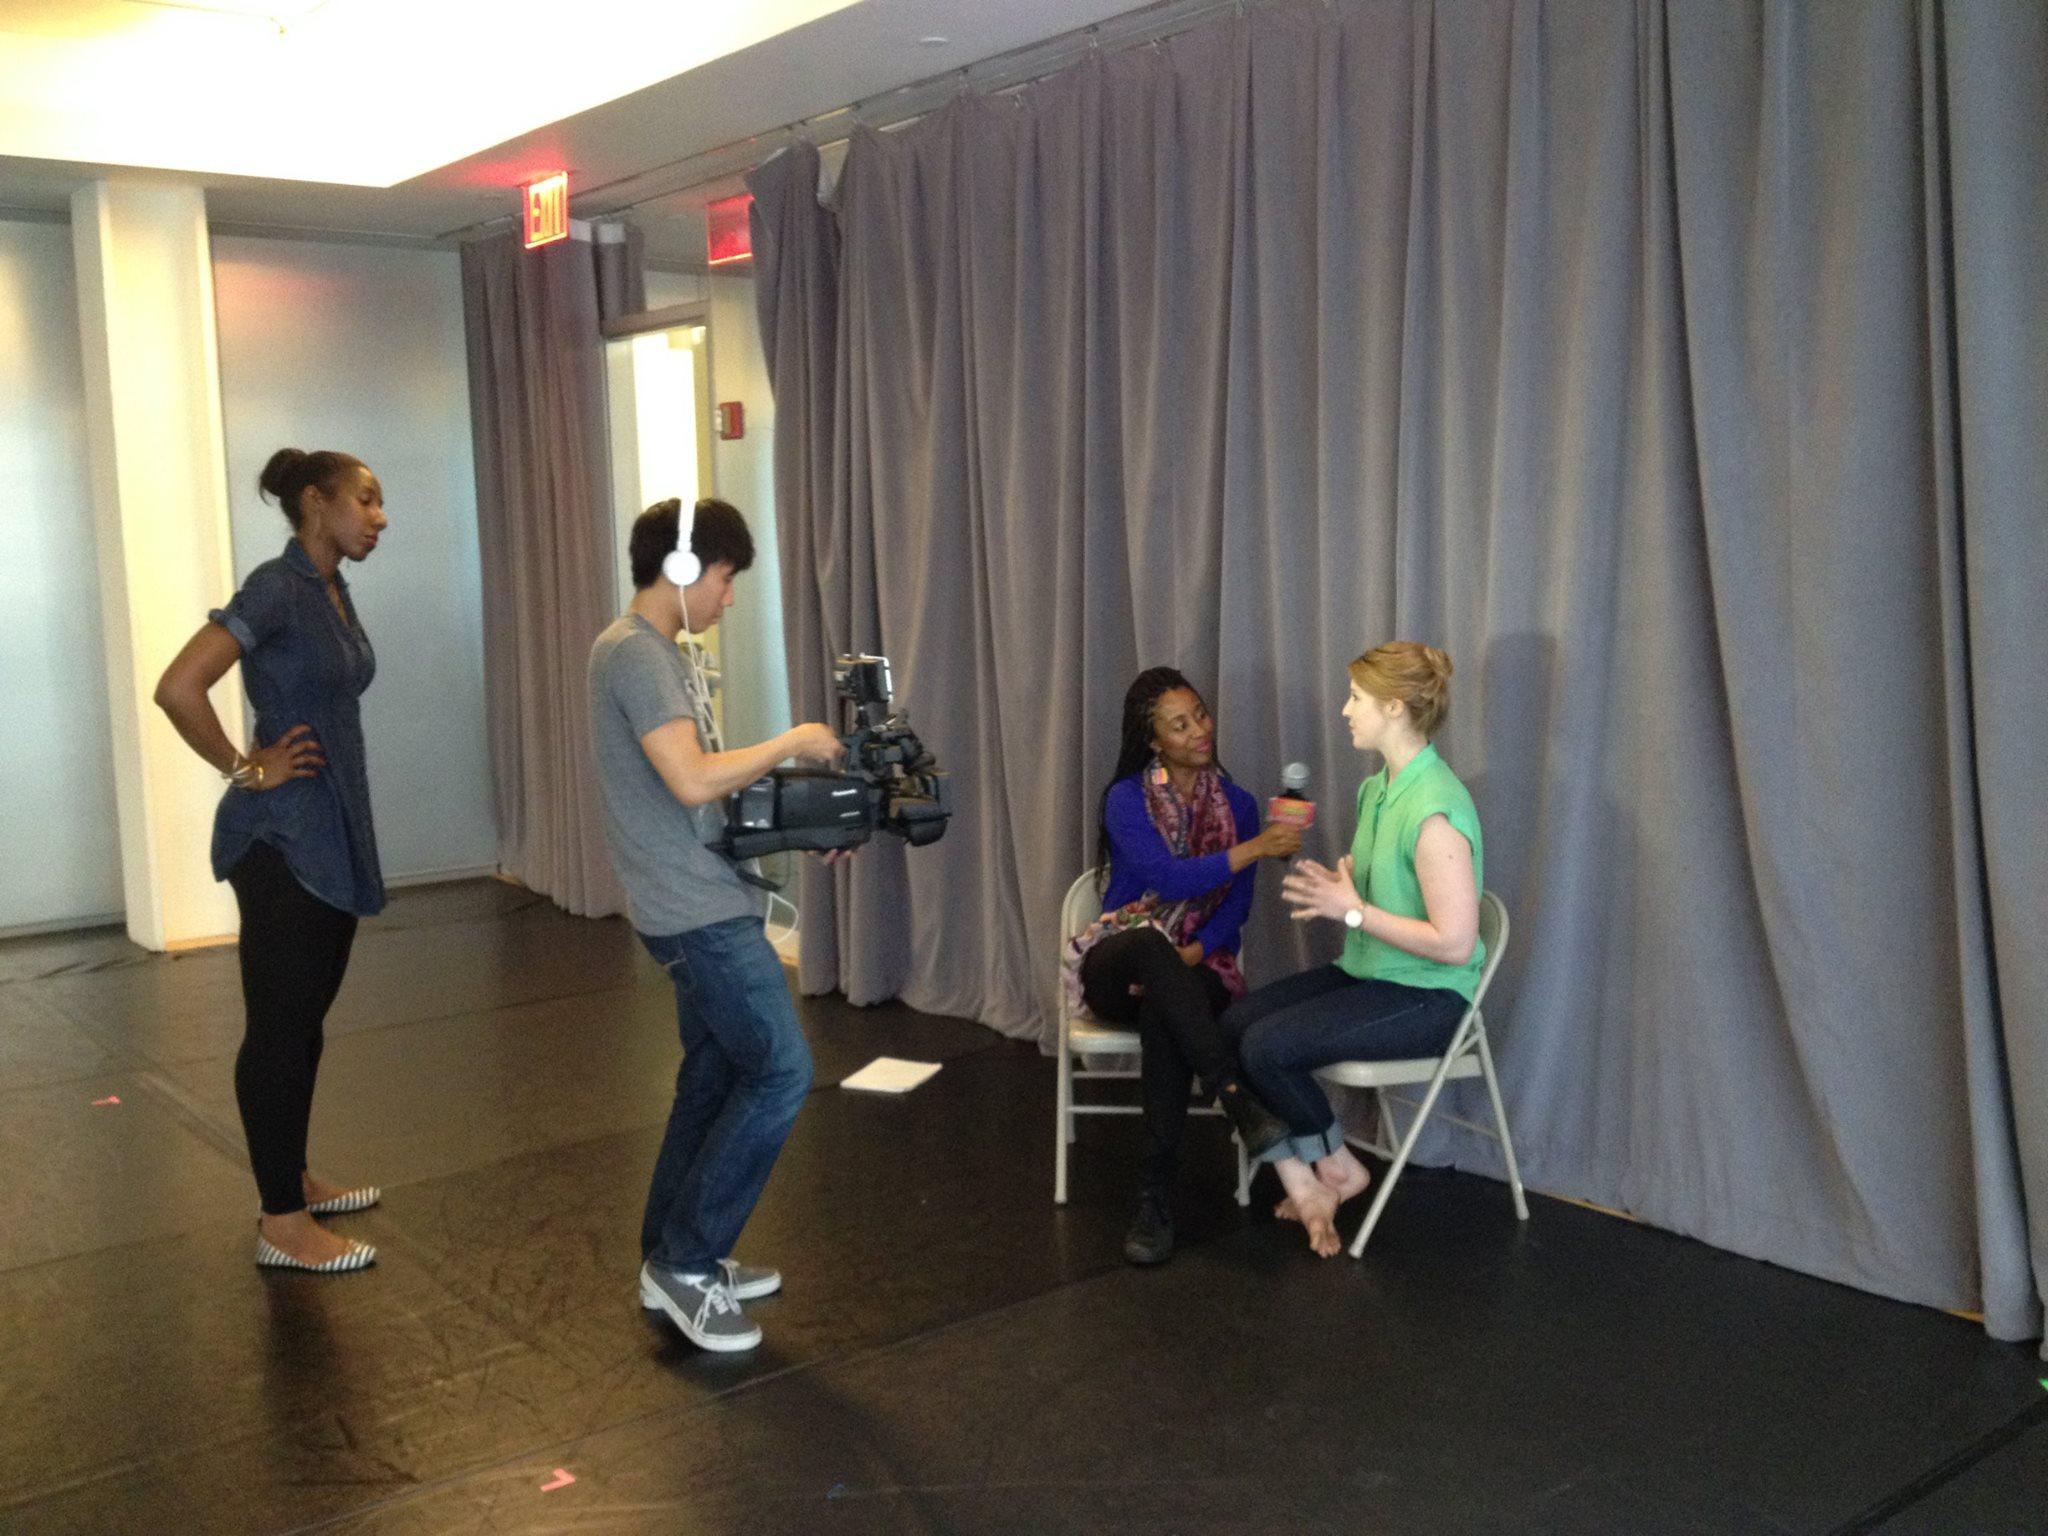 Interviewed by Lynette Nicholas for Stagebuddy.com